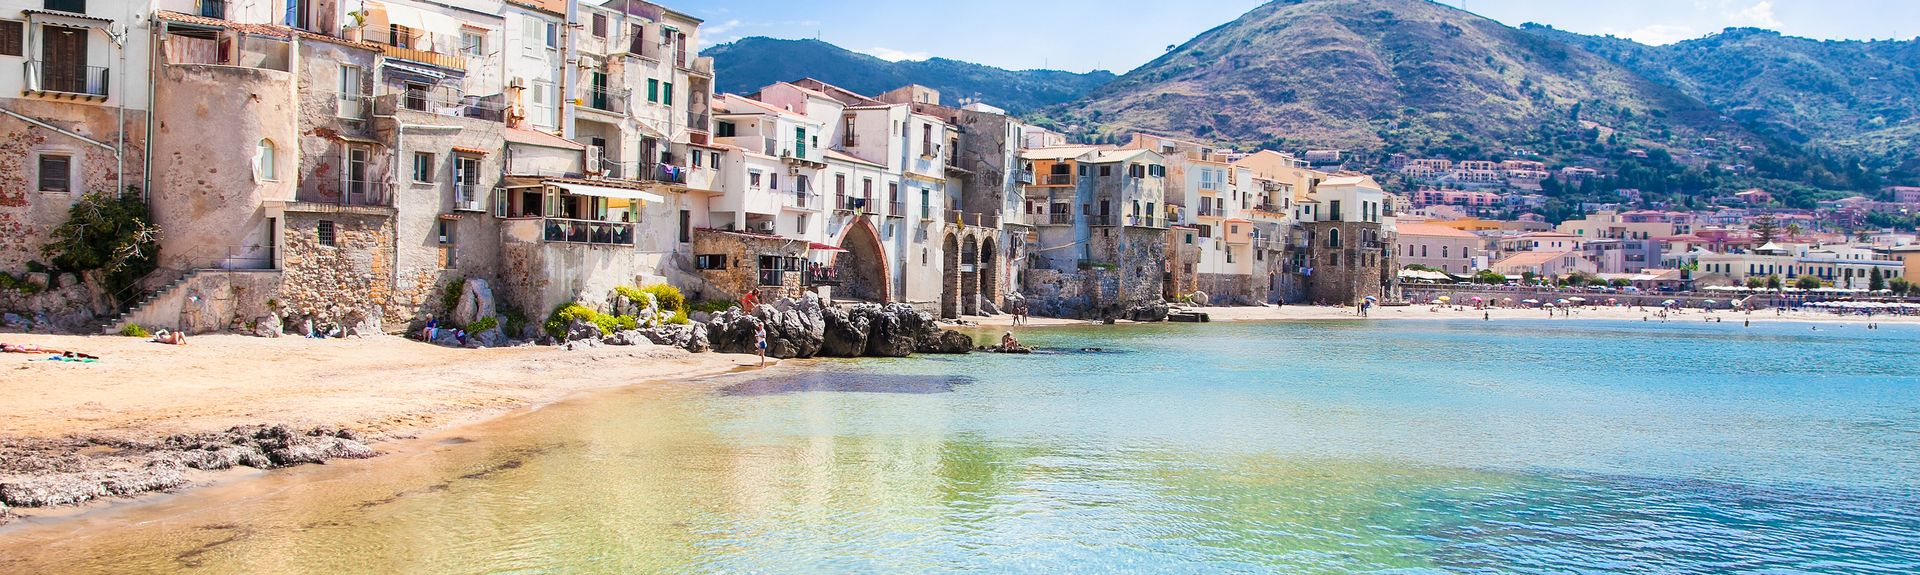 Palermo, Palermo, Sicília, Itália